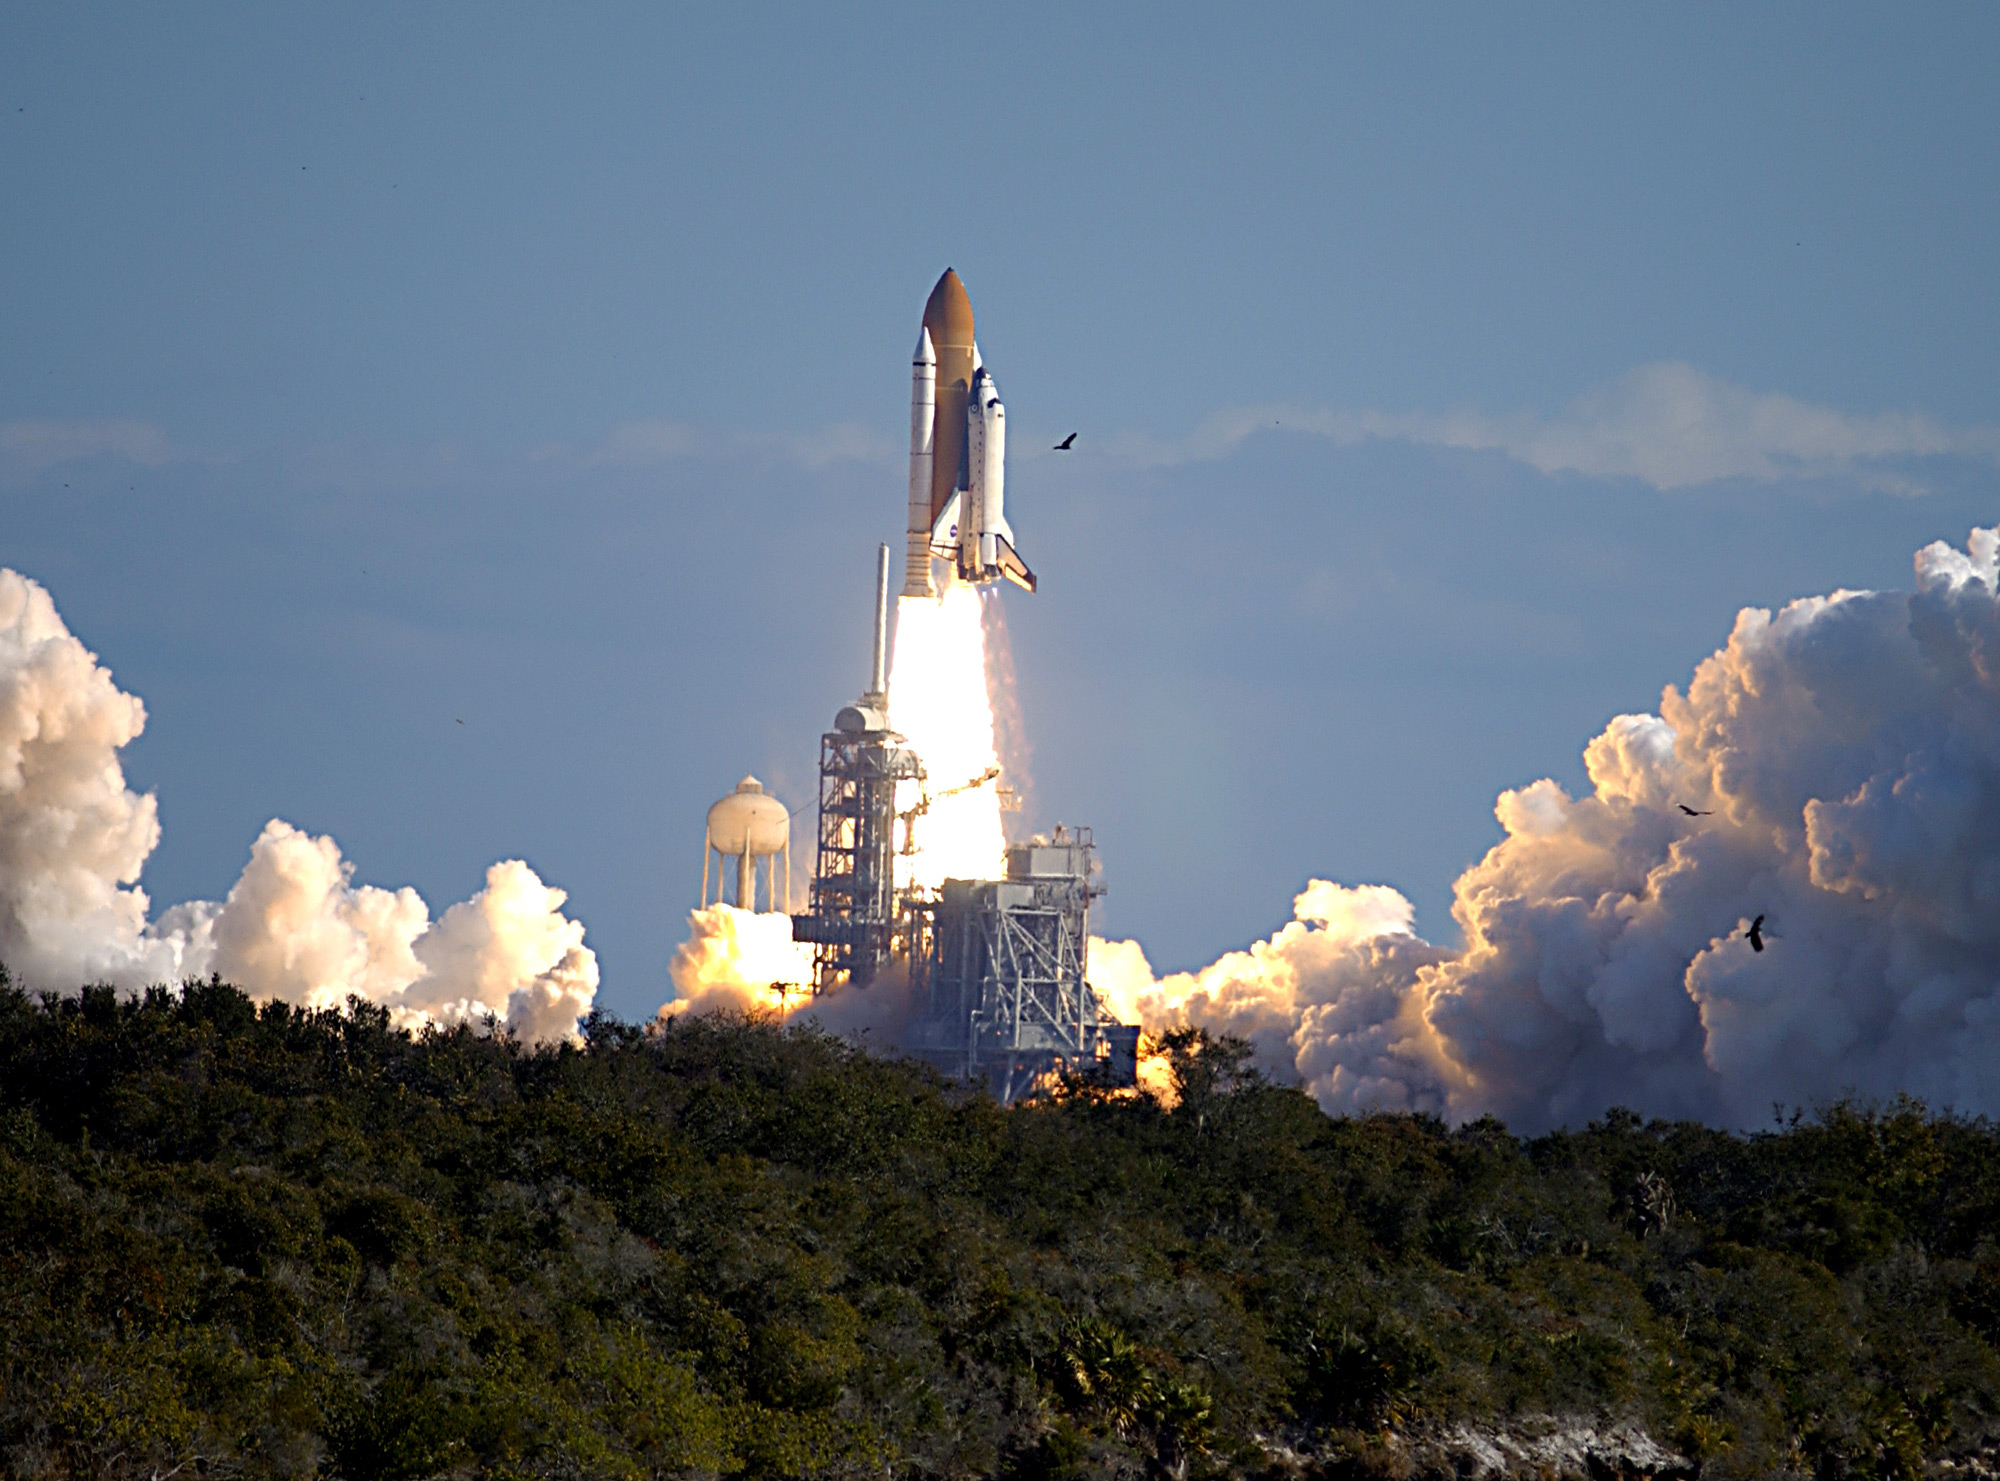 Columbia Shuttle Disaster's Tough Lesson: Spaceflight Still Dangerous